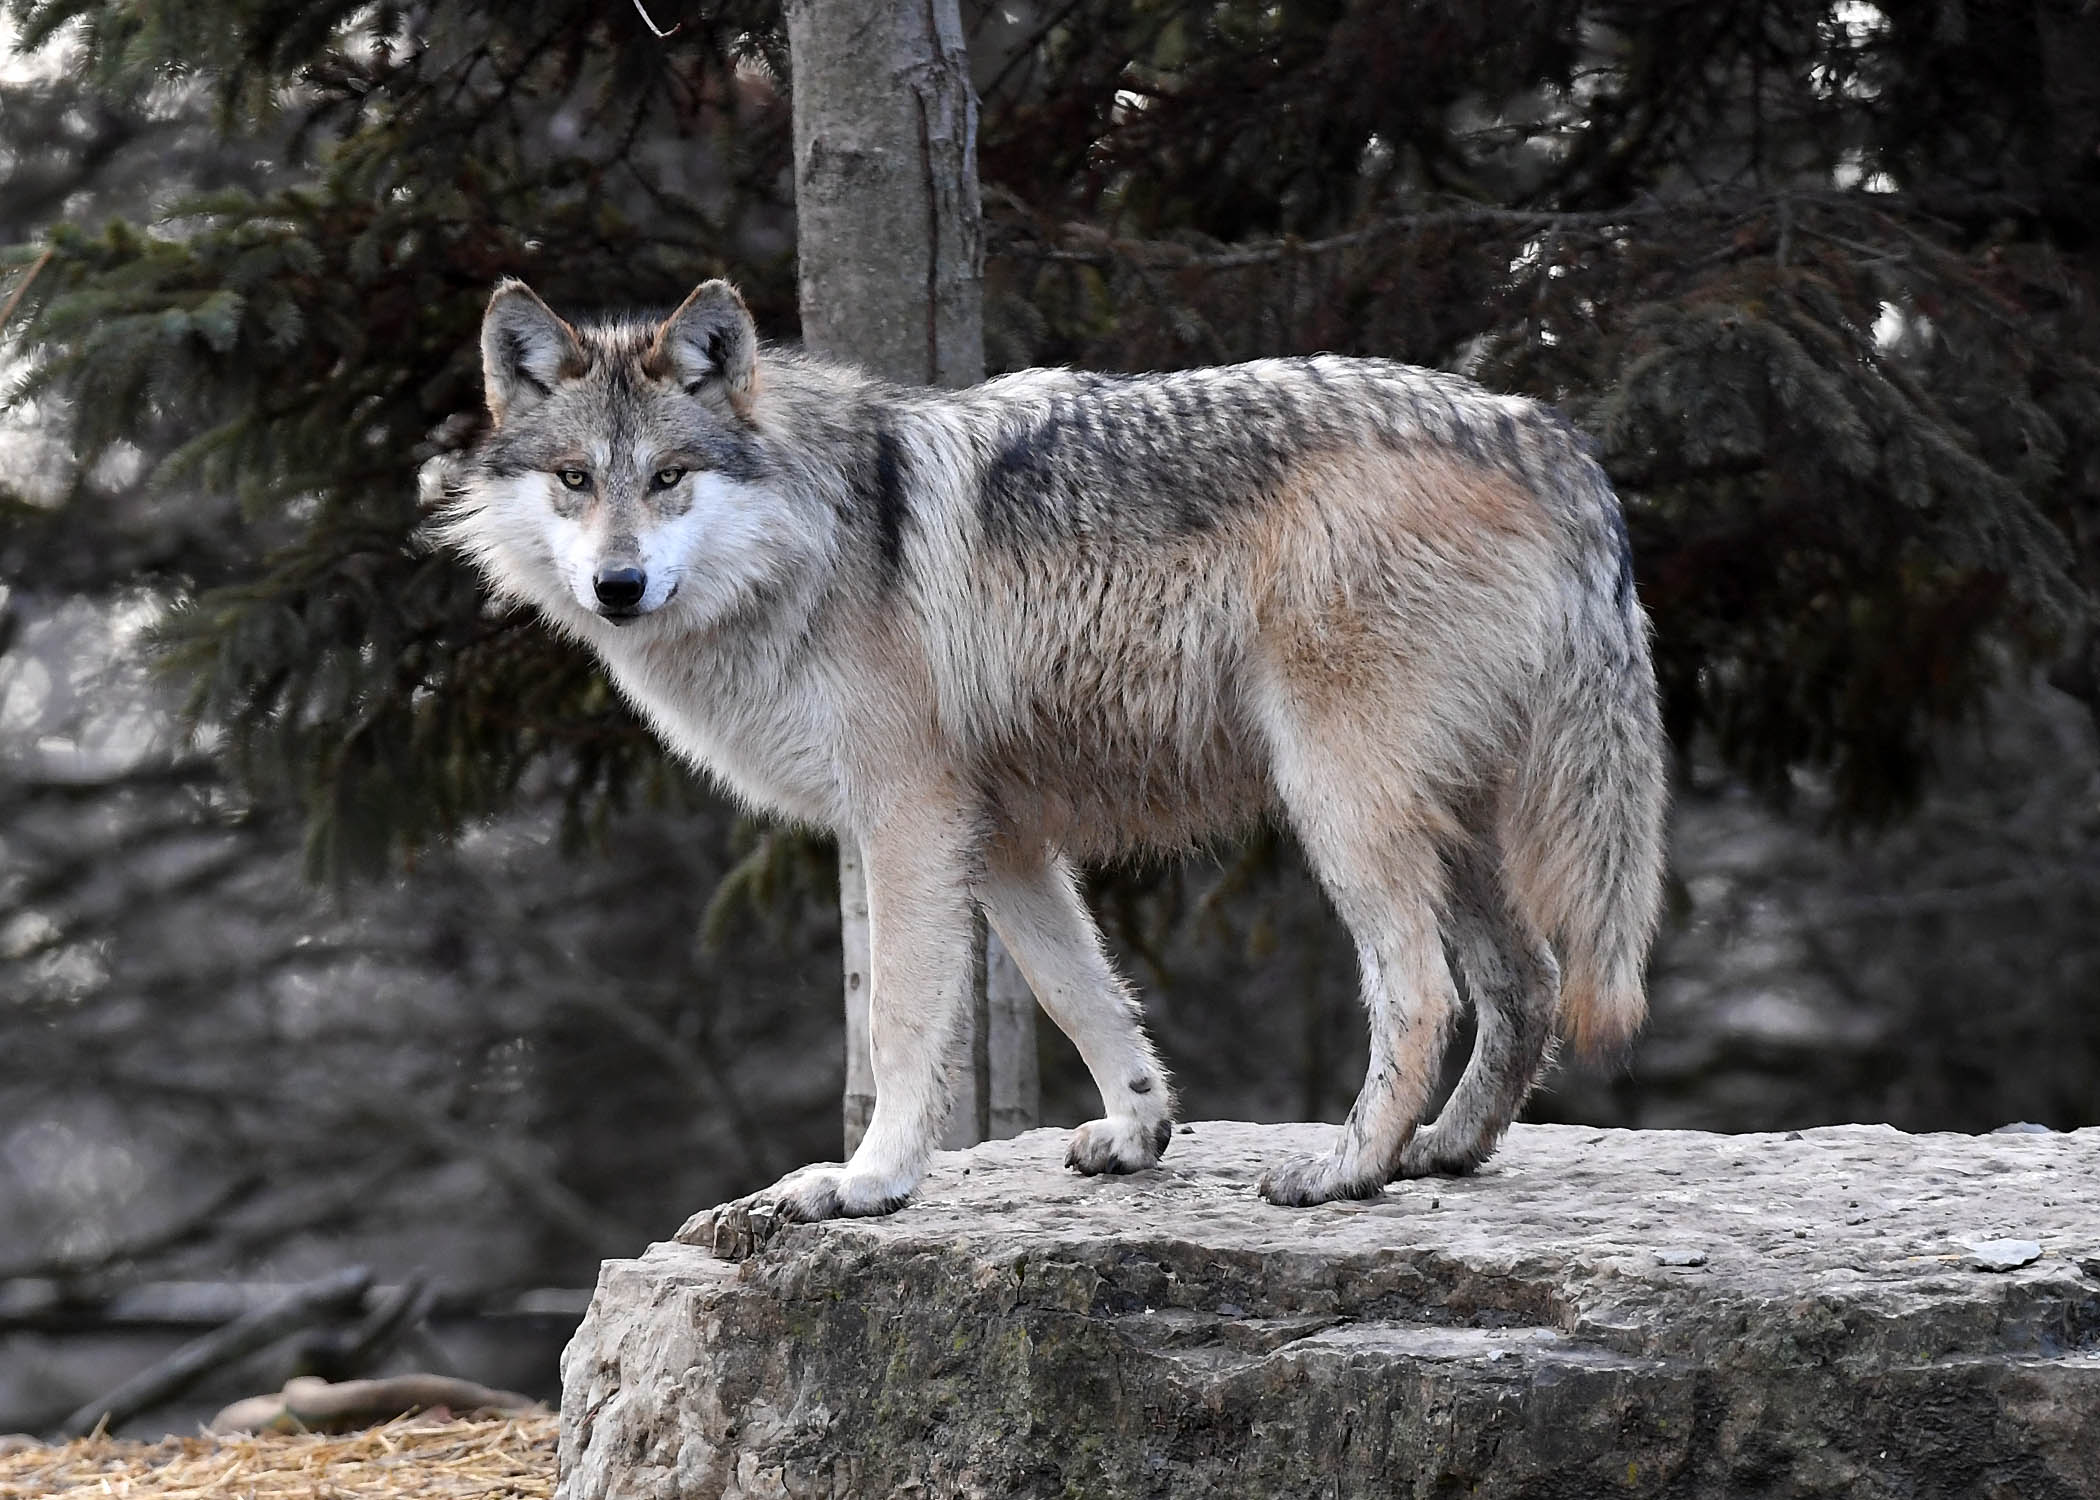 Arizona man gets probation for Mexican gray wolf killing   Williams-Grand  Canyon News   Williams-Grand Canyon, AZ